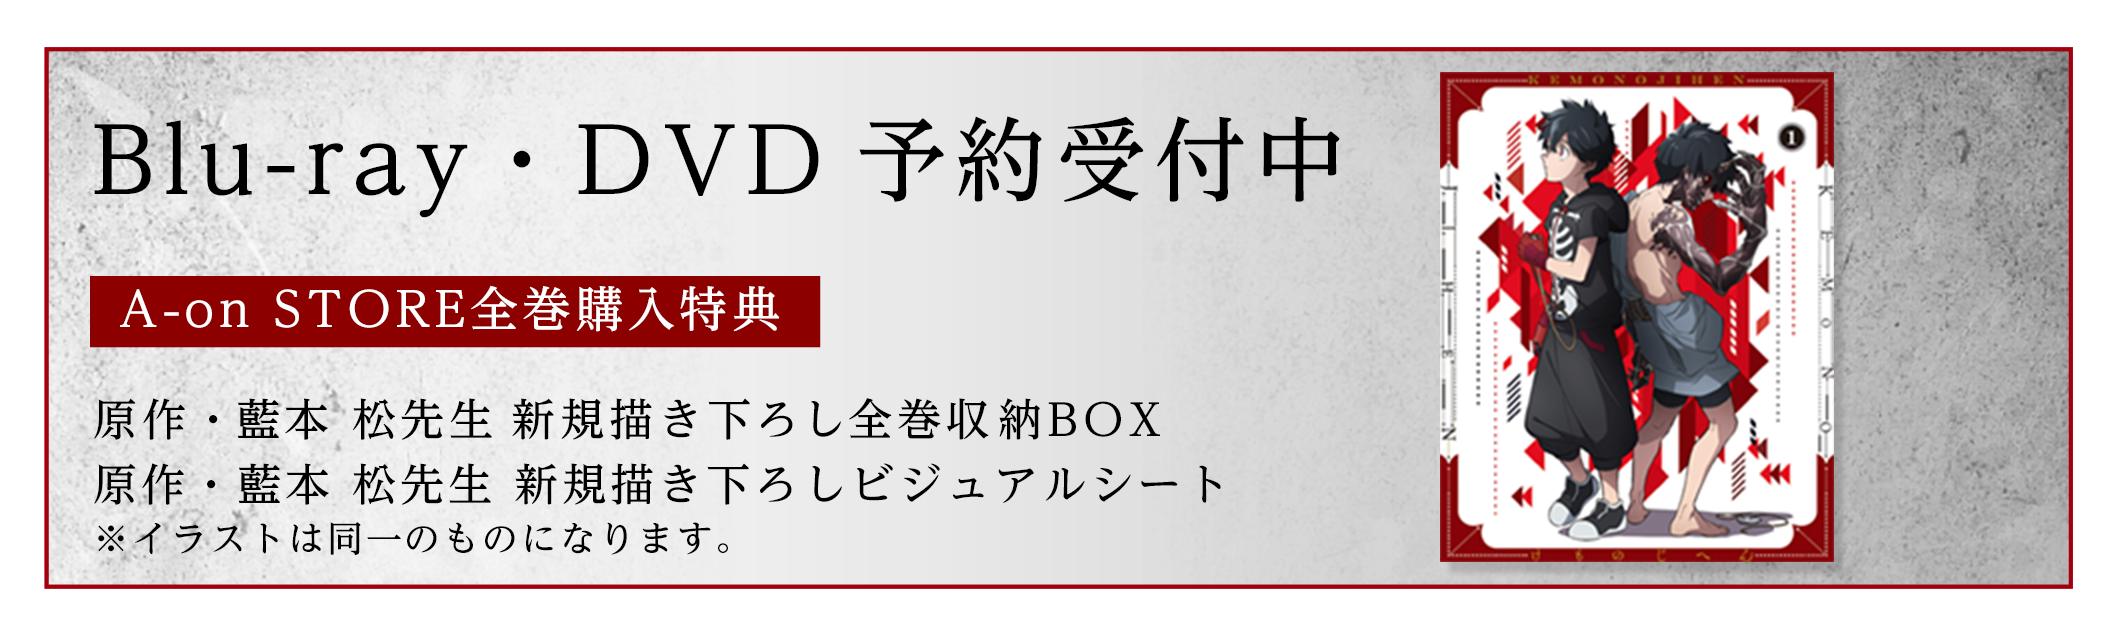 Blu-ray・DVD 予約受付中                 A-on STORE全巻購入特典                 原作・藍本 松先生 新規描き下ろし全巻収納BOX                 原作・藍本 松先生 新規描き下ろしビジュアルシート